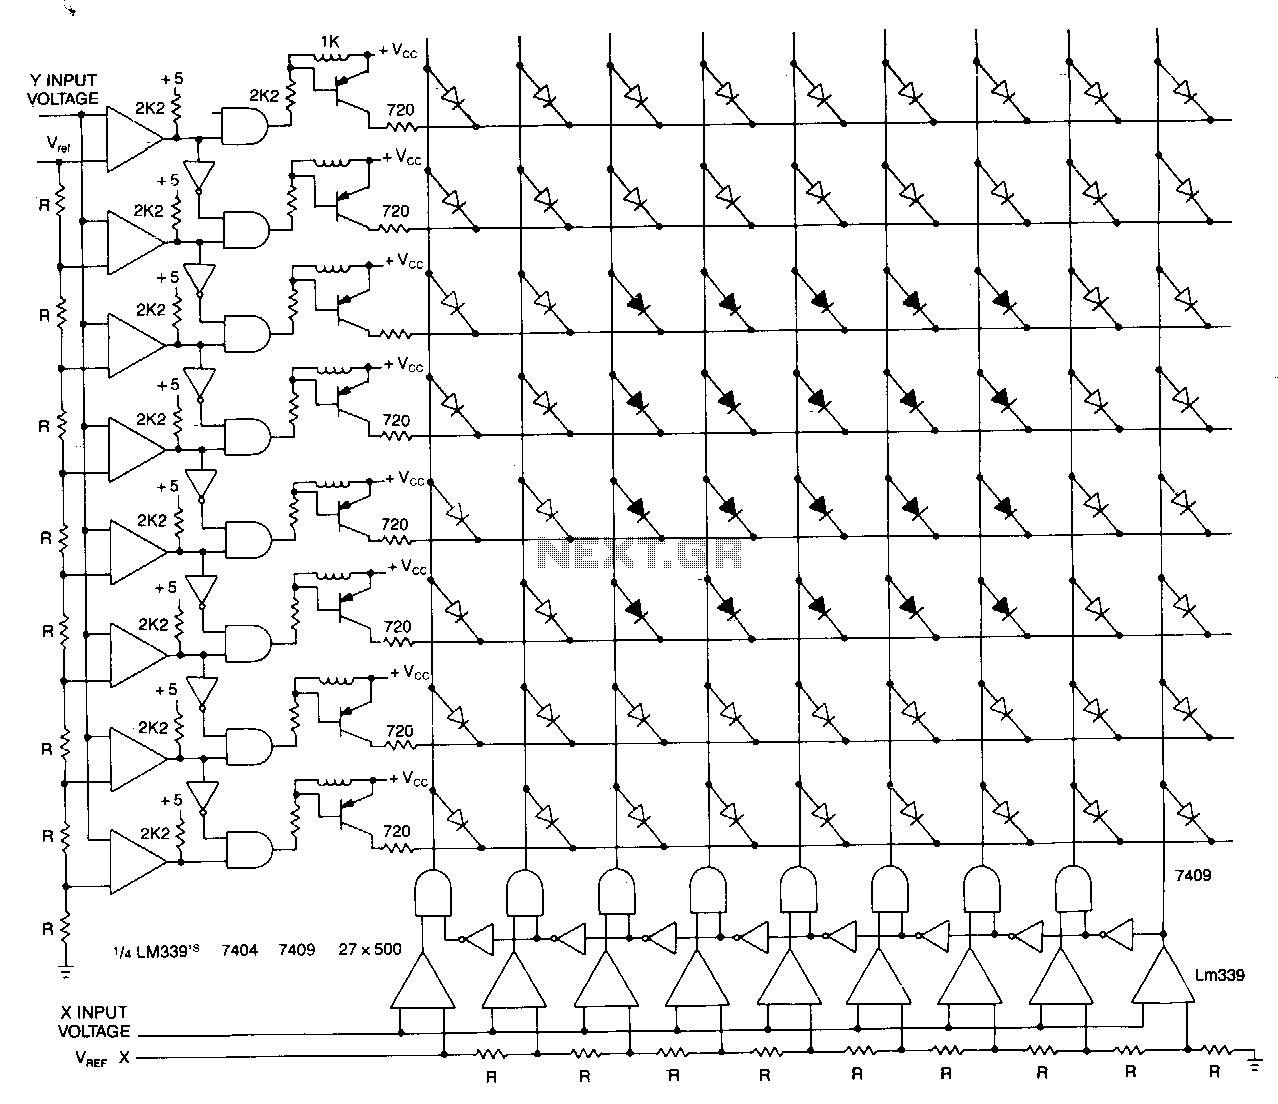 circuit diagram 4x4 matrix keypad